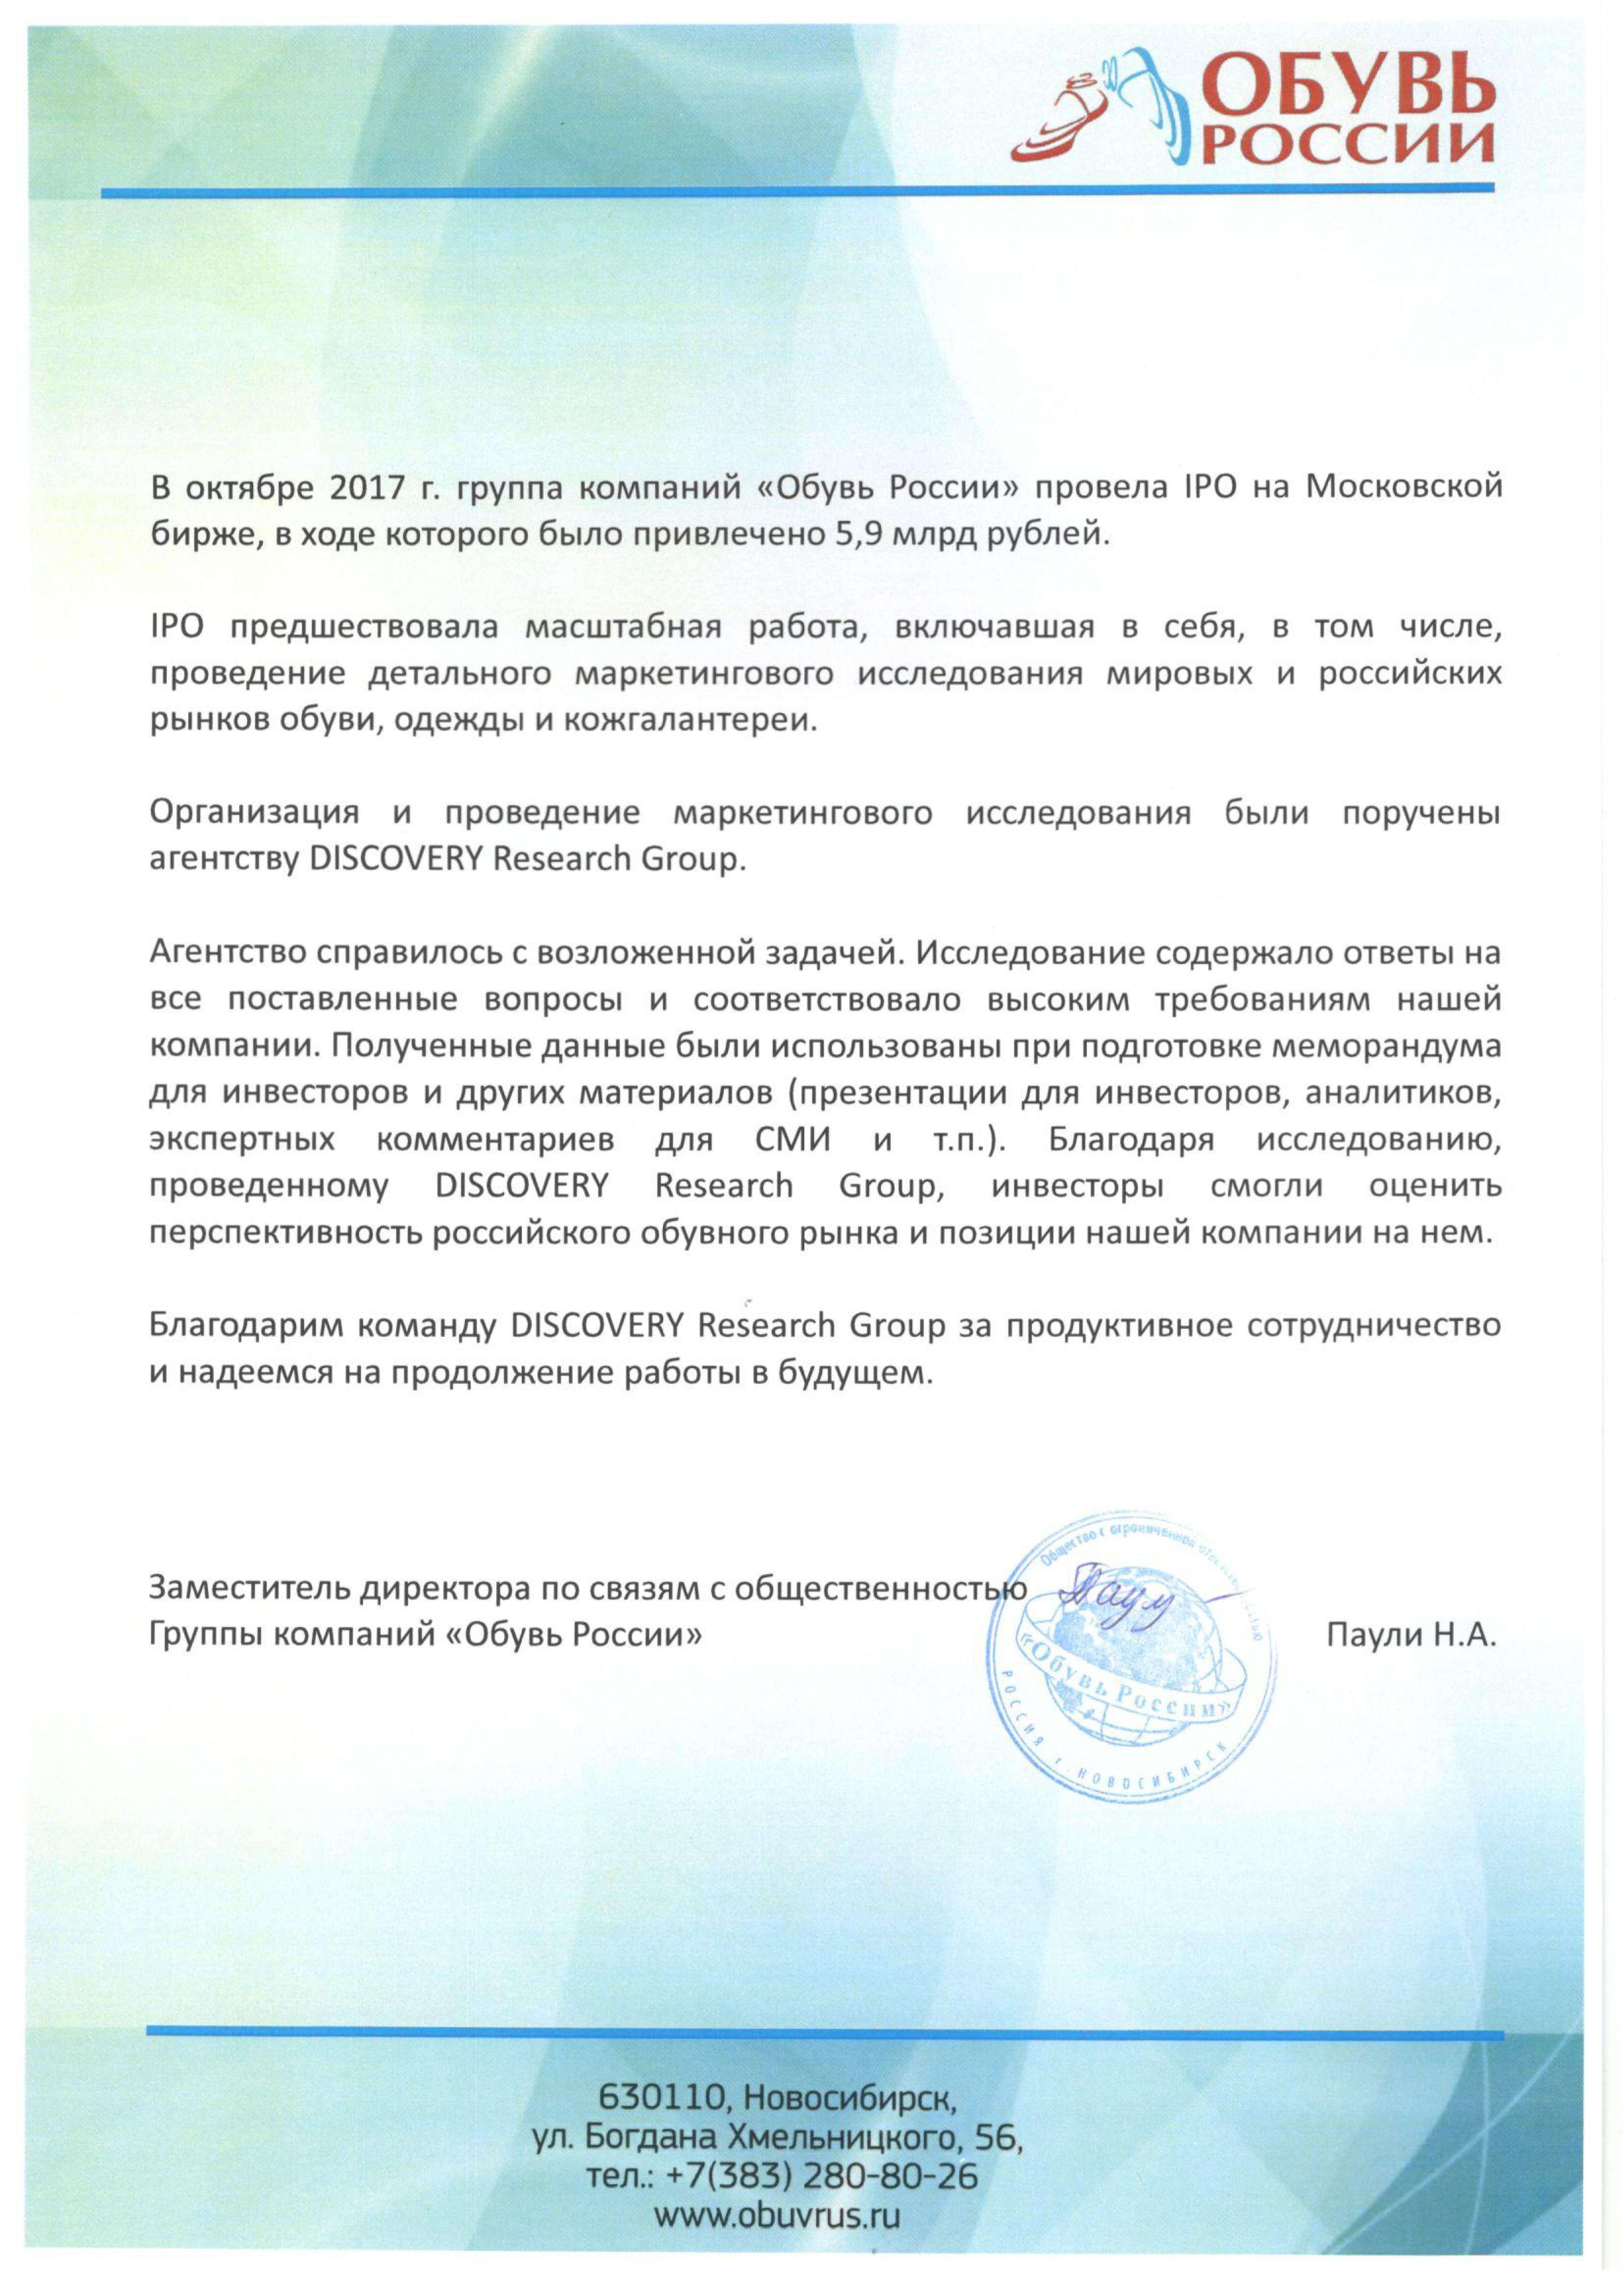 http://drgroup.ru/images/obuv-rf.jpg